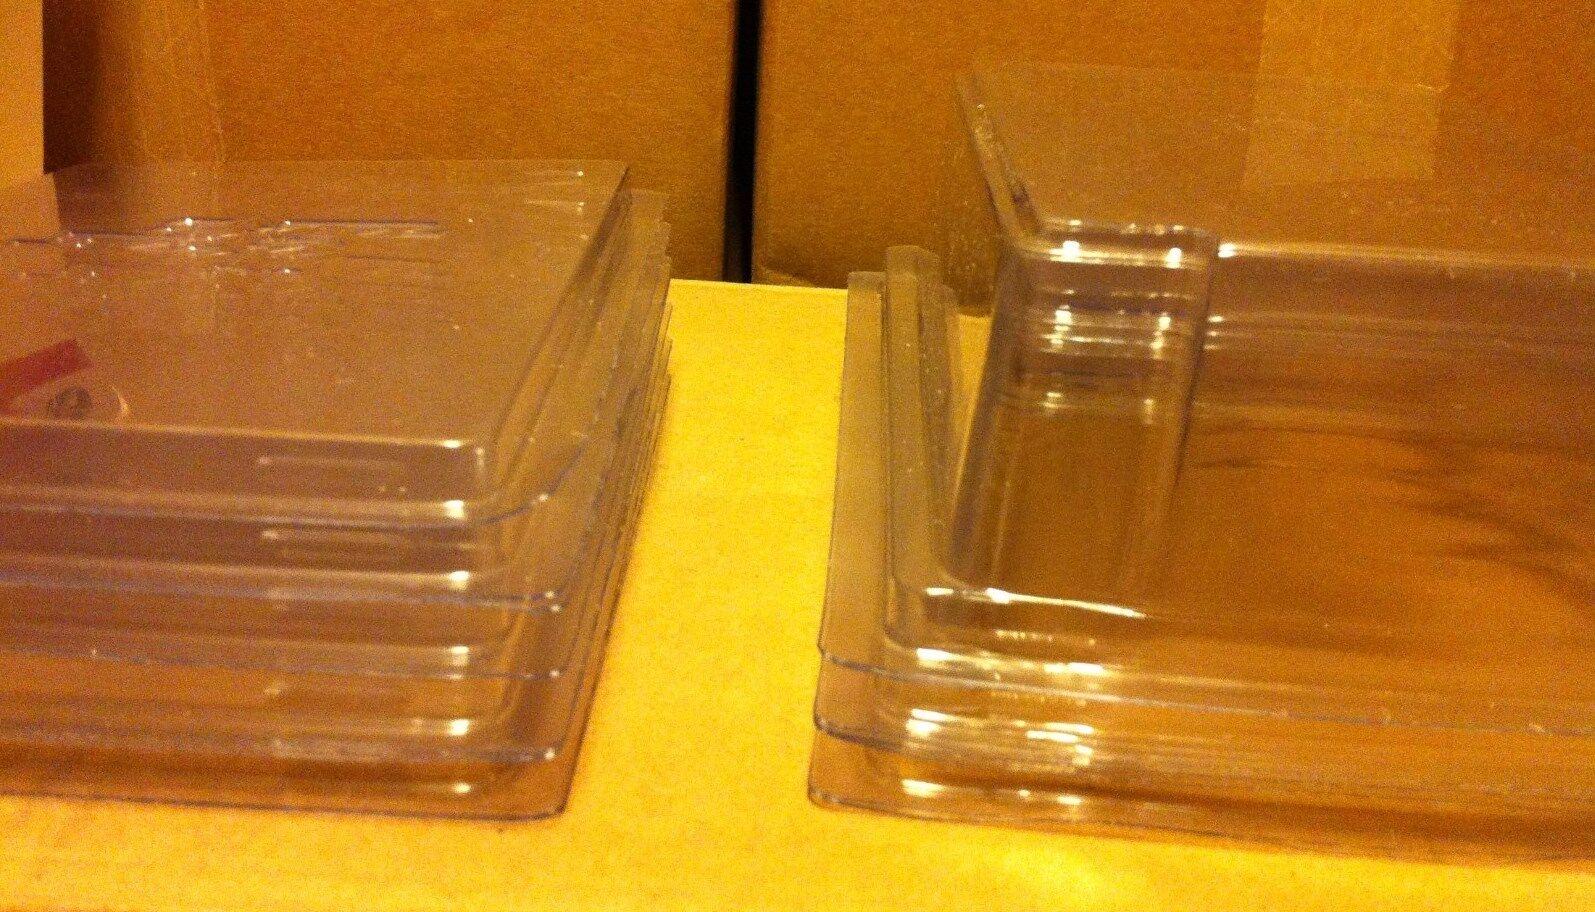 Lot of 25 Prougeech STAR CASE Display  Cases - Vintage Star Wars GI Joe Marvel nouveau  acheter des rabais